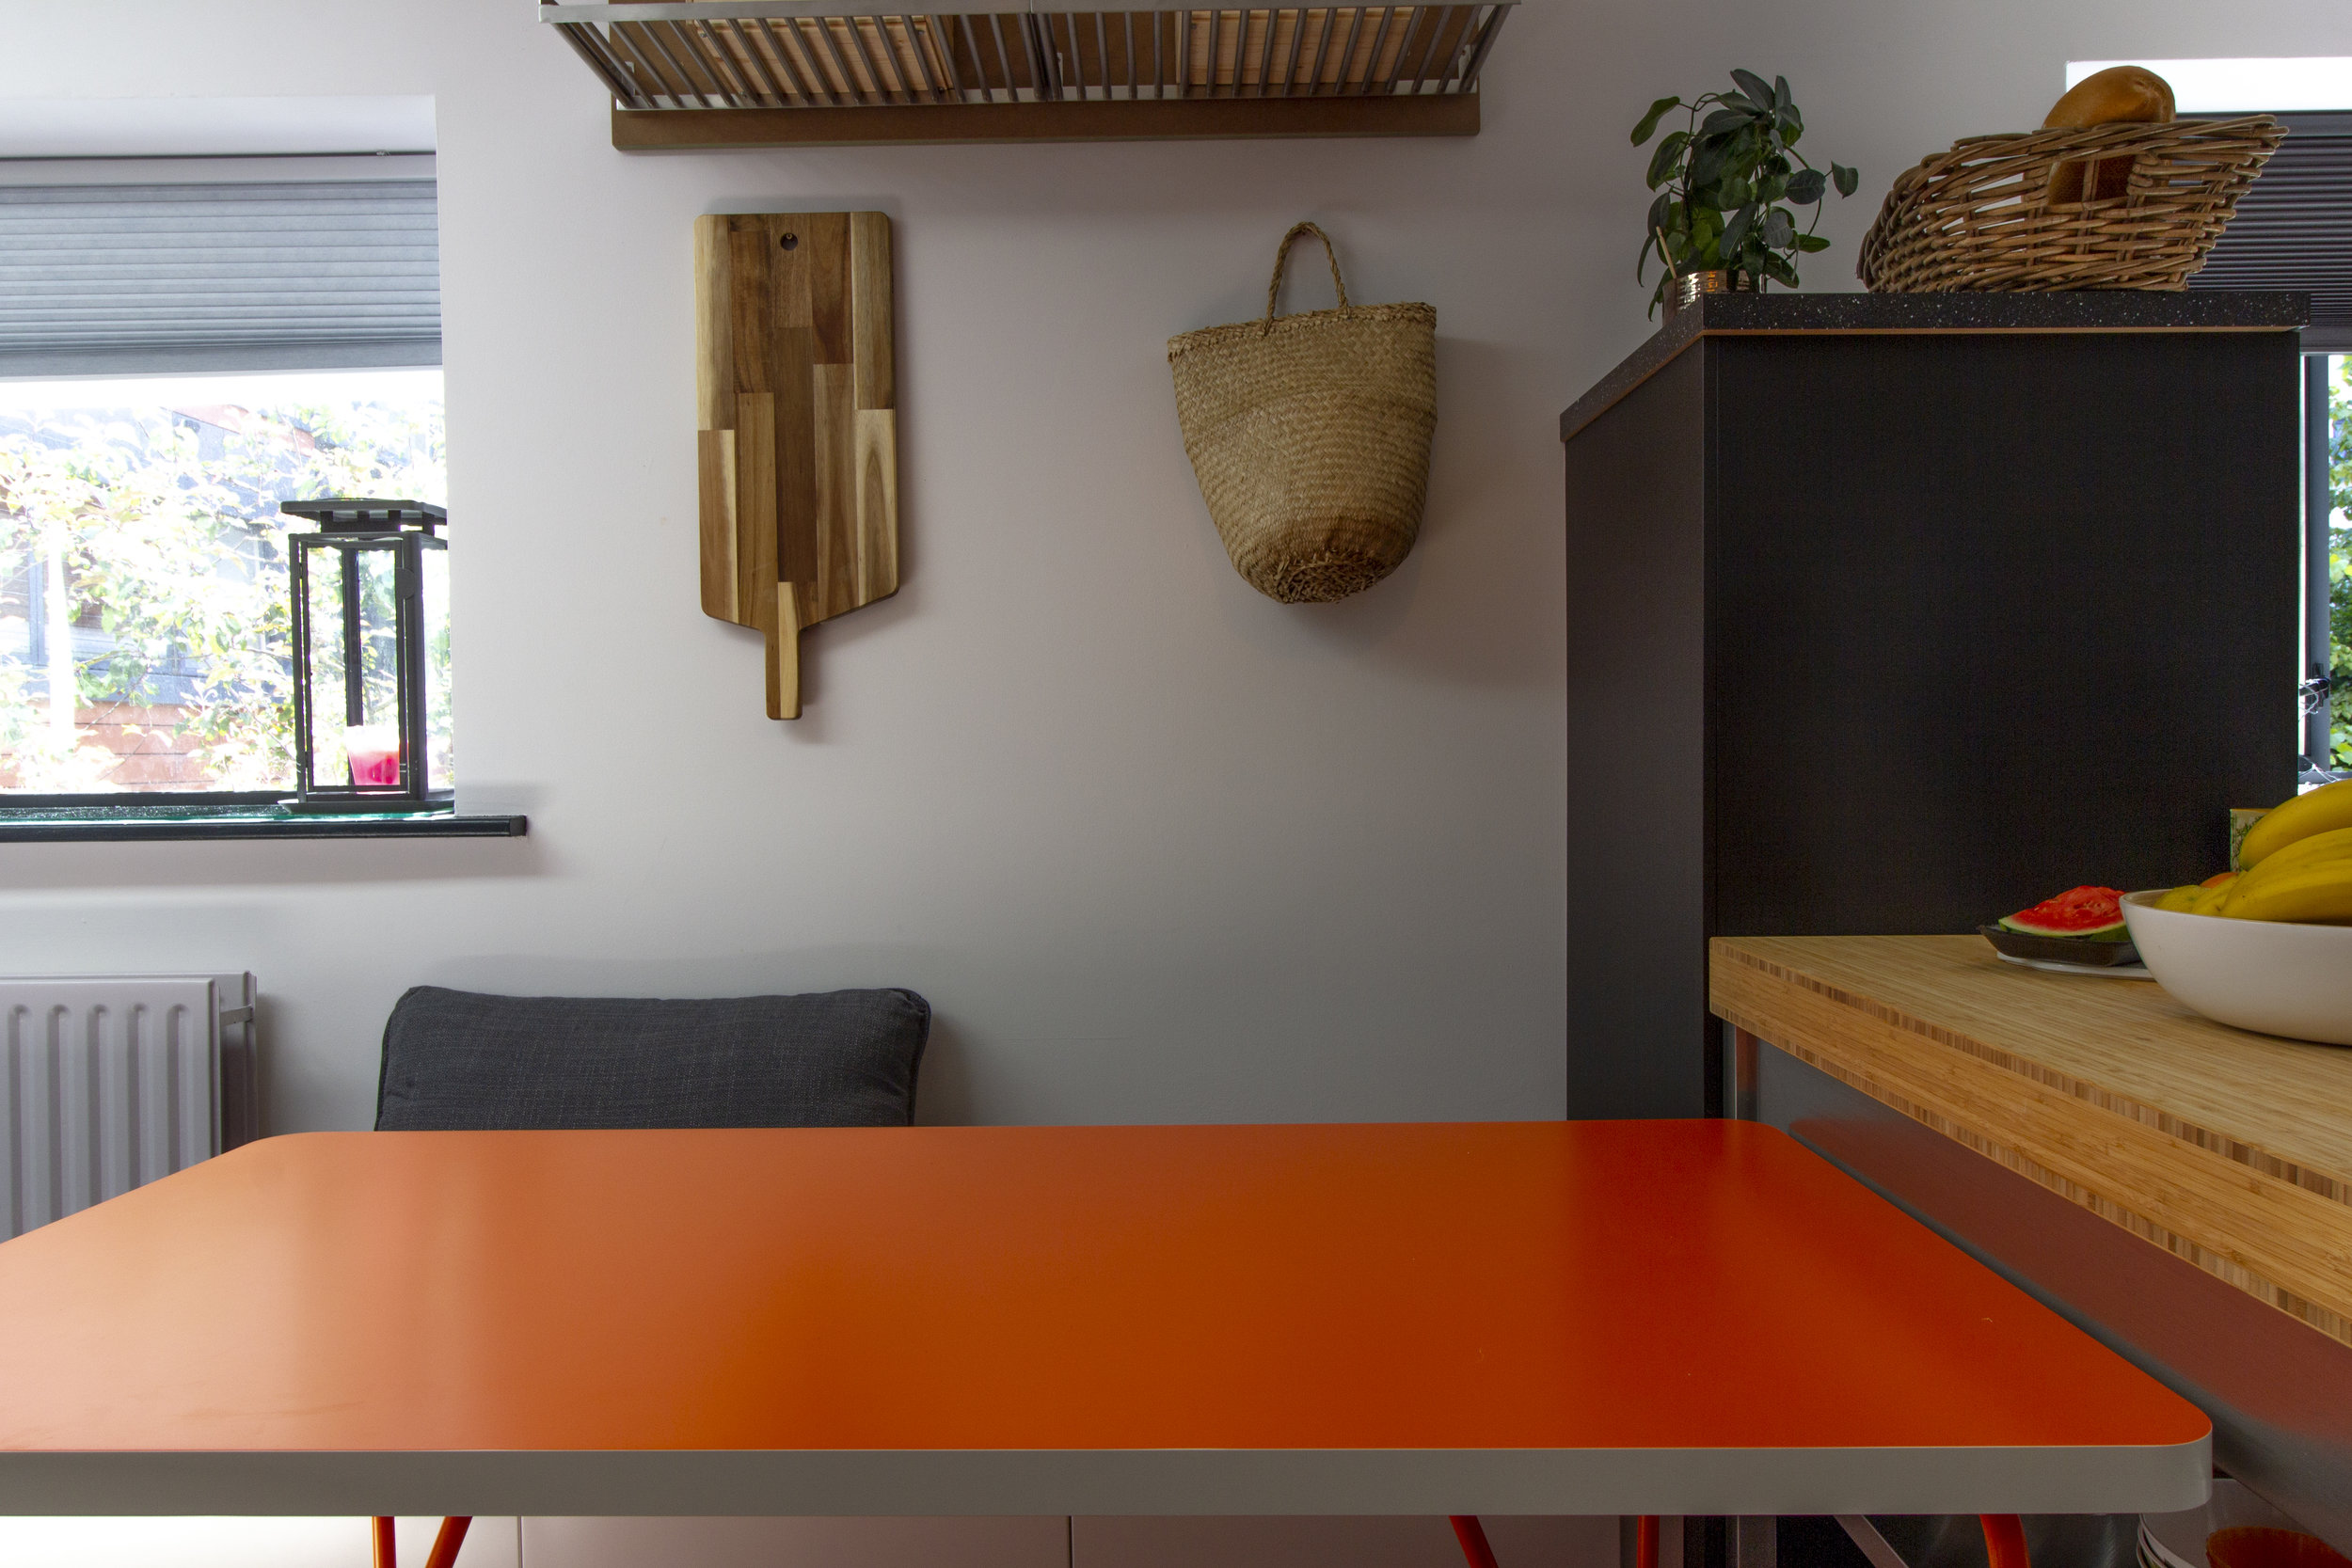 HR - Dublin 1 - After - Living Room Kitchen 27.jpg